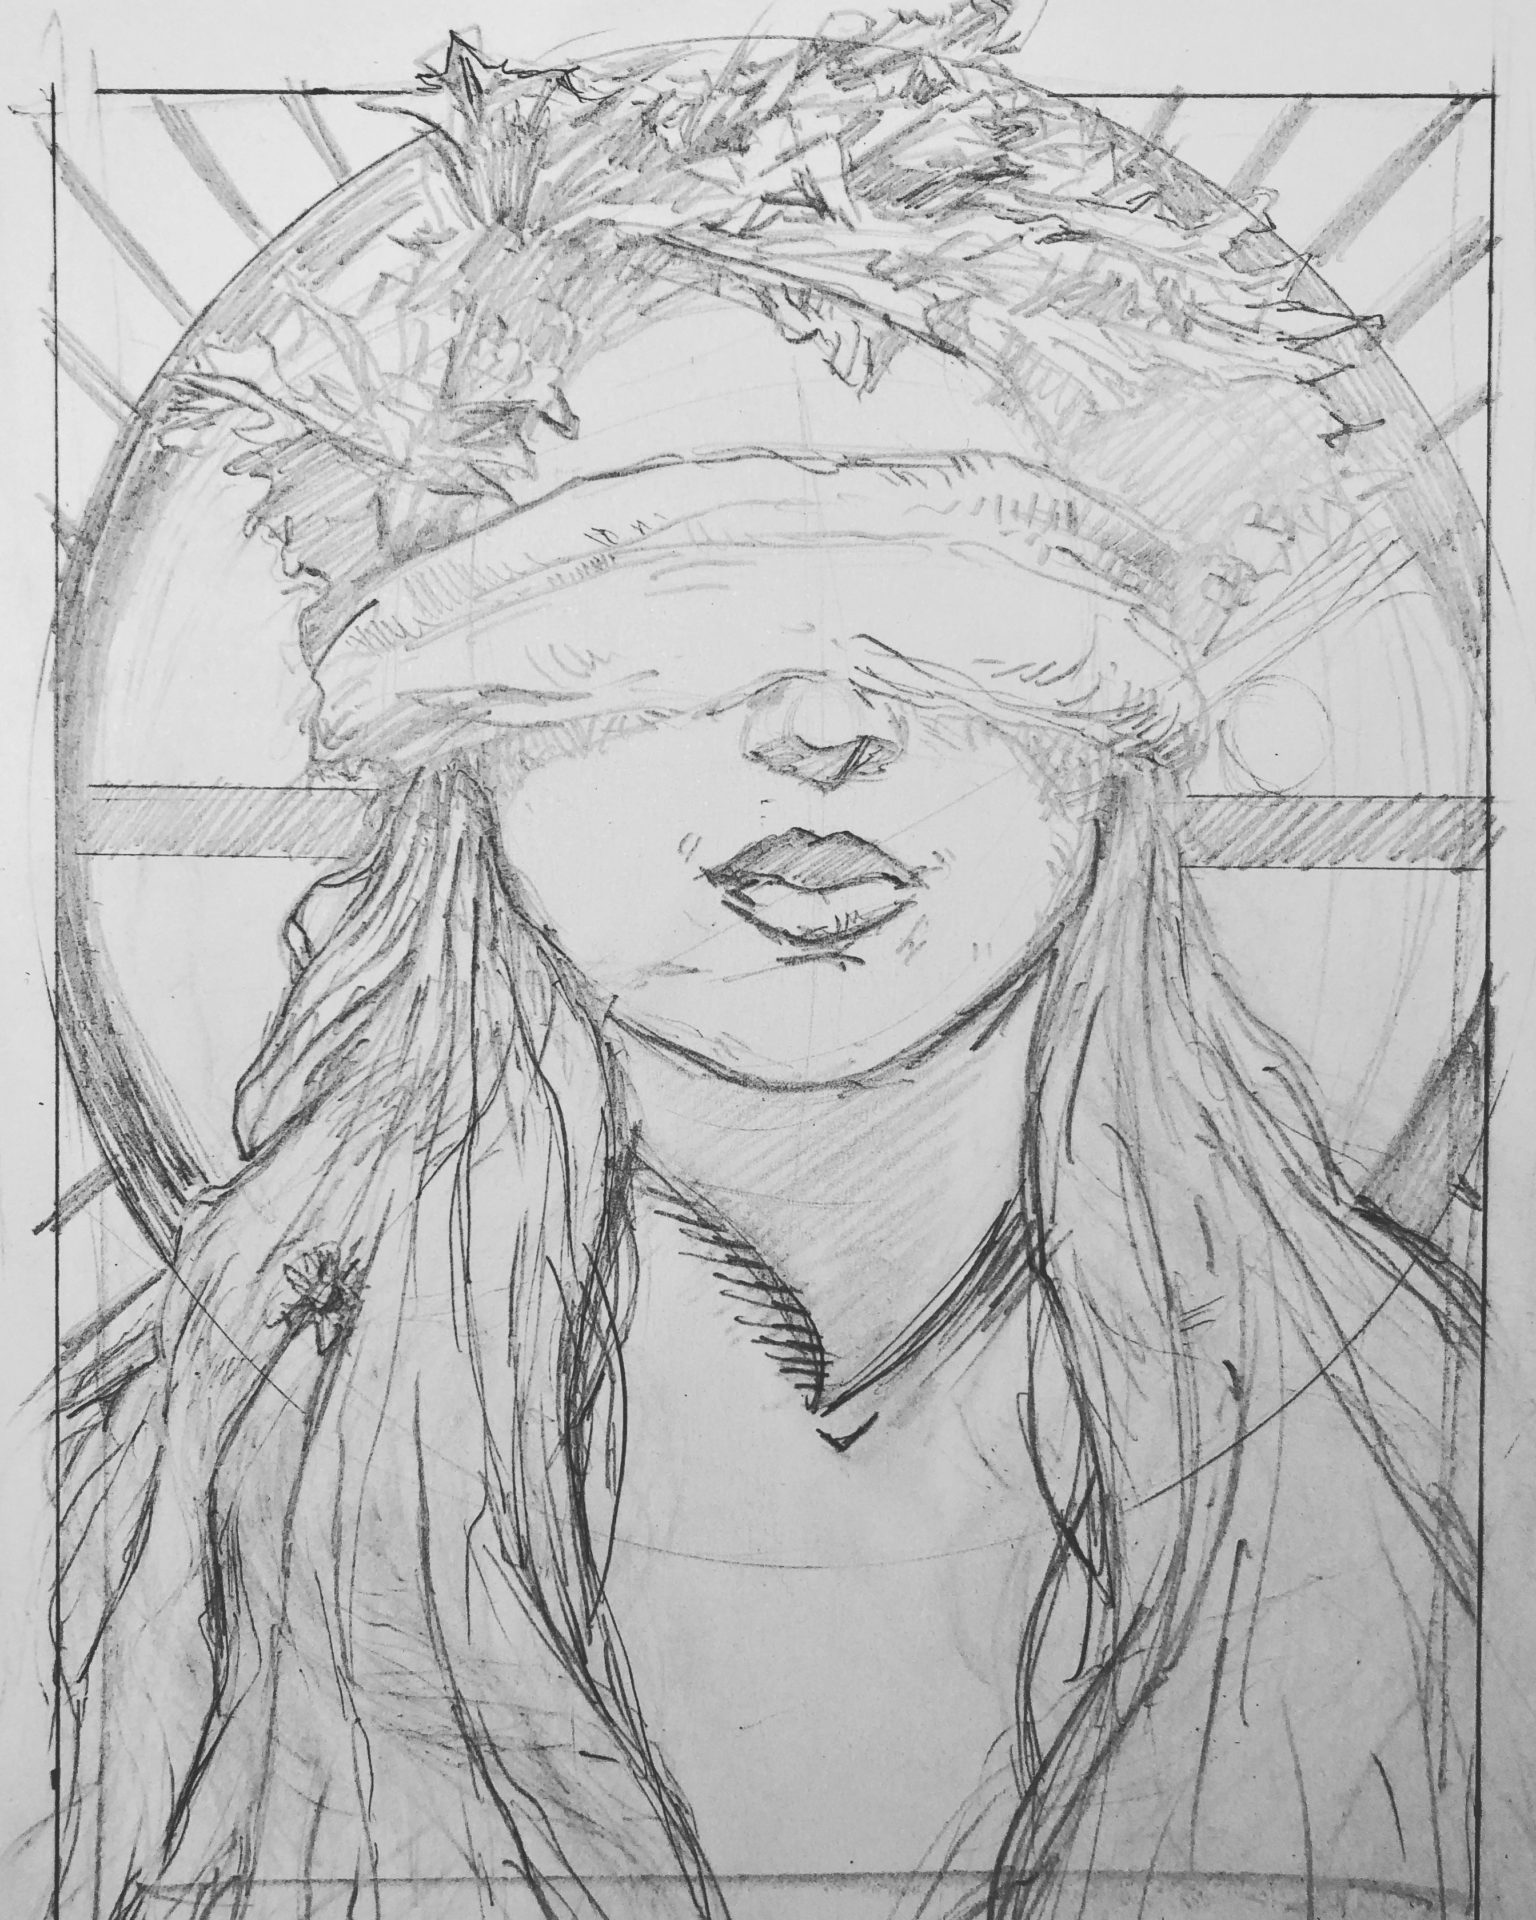 Spring Lady Sketch